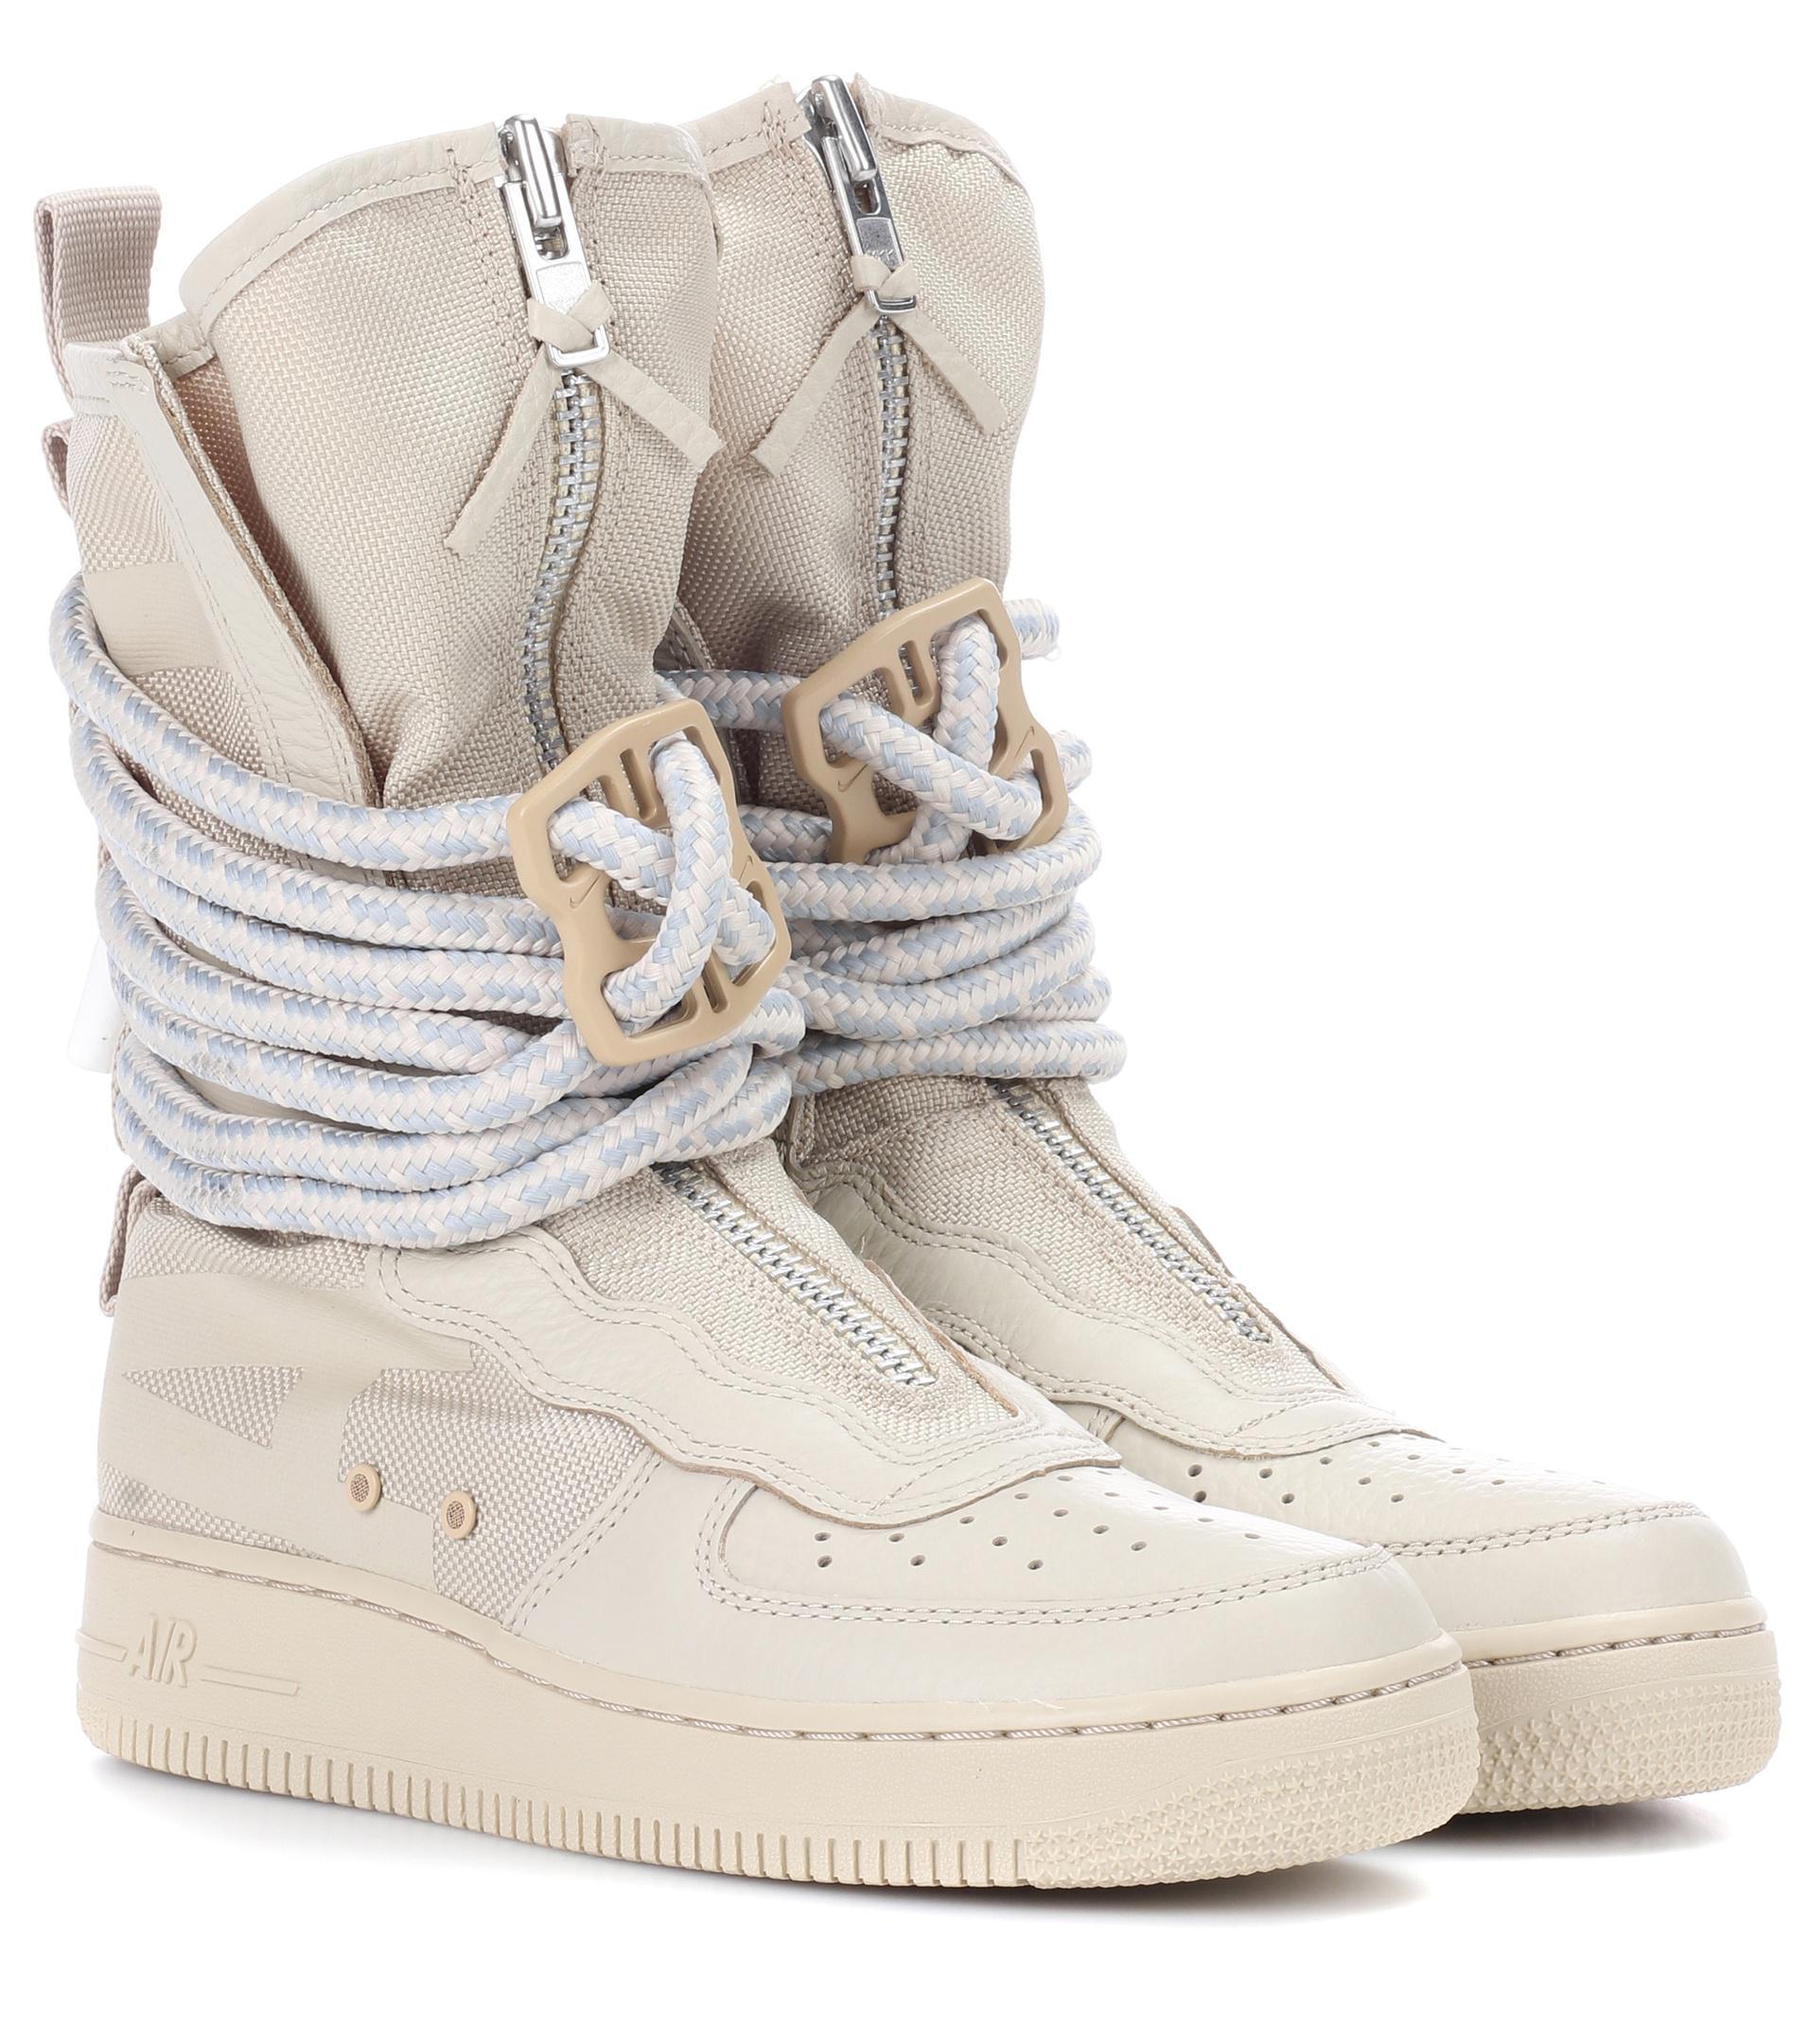 Sf Lyst Nike Air Force Natural 1 Botas De Cuero Natural Force 677f4d